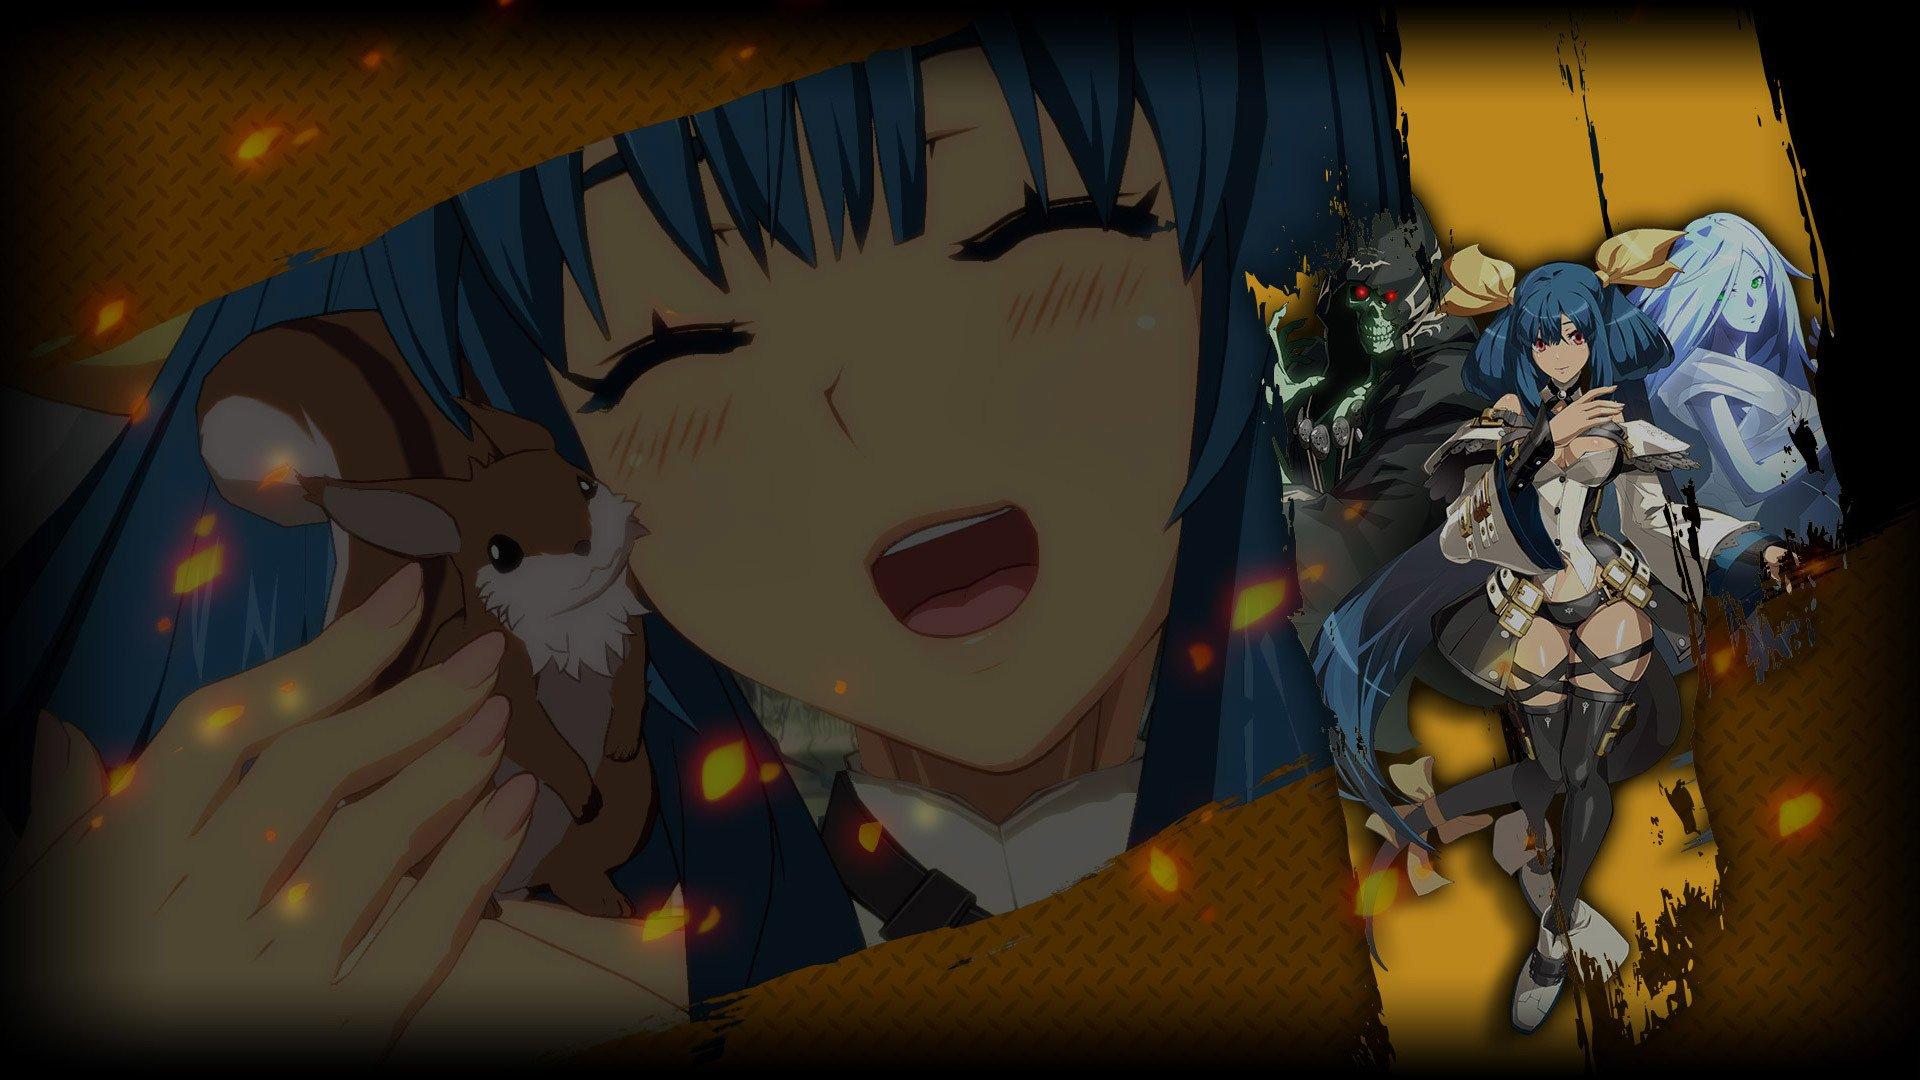 Guilty Gear Xrd Revelator Hd Wallpaper Background Image